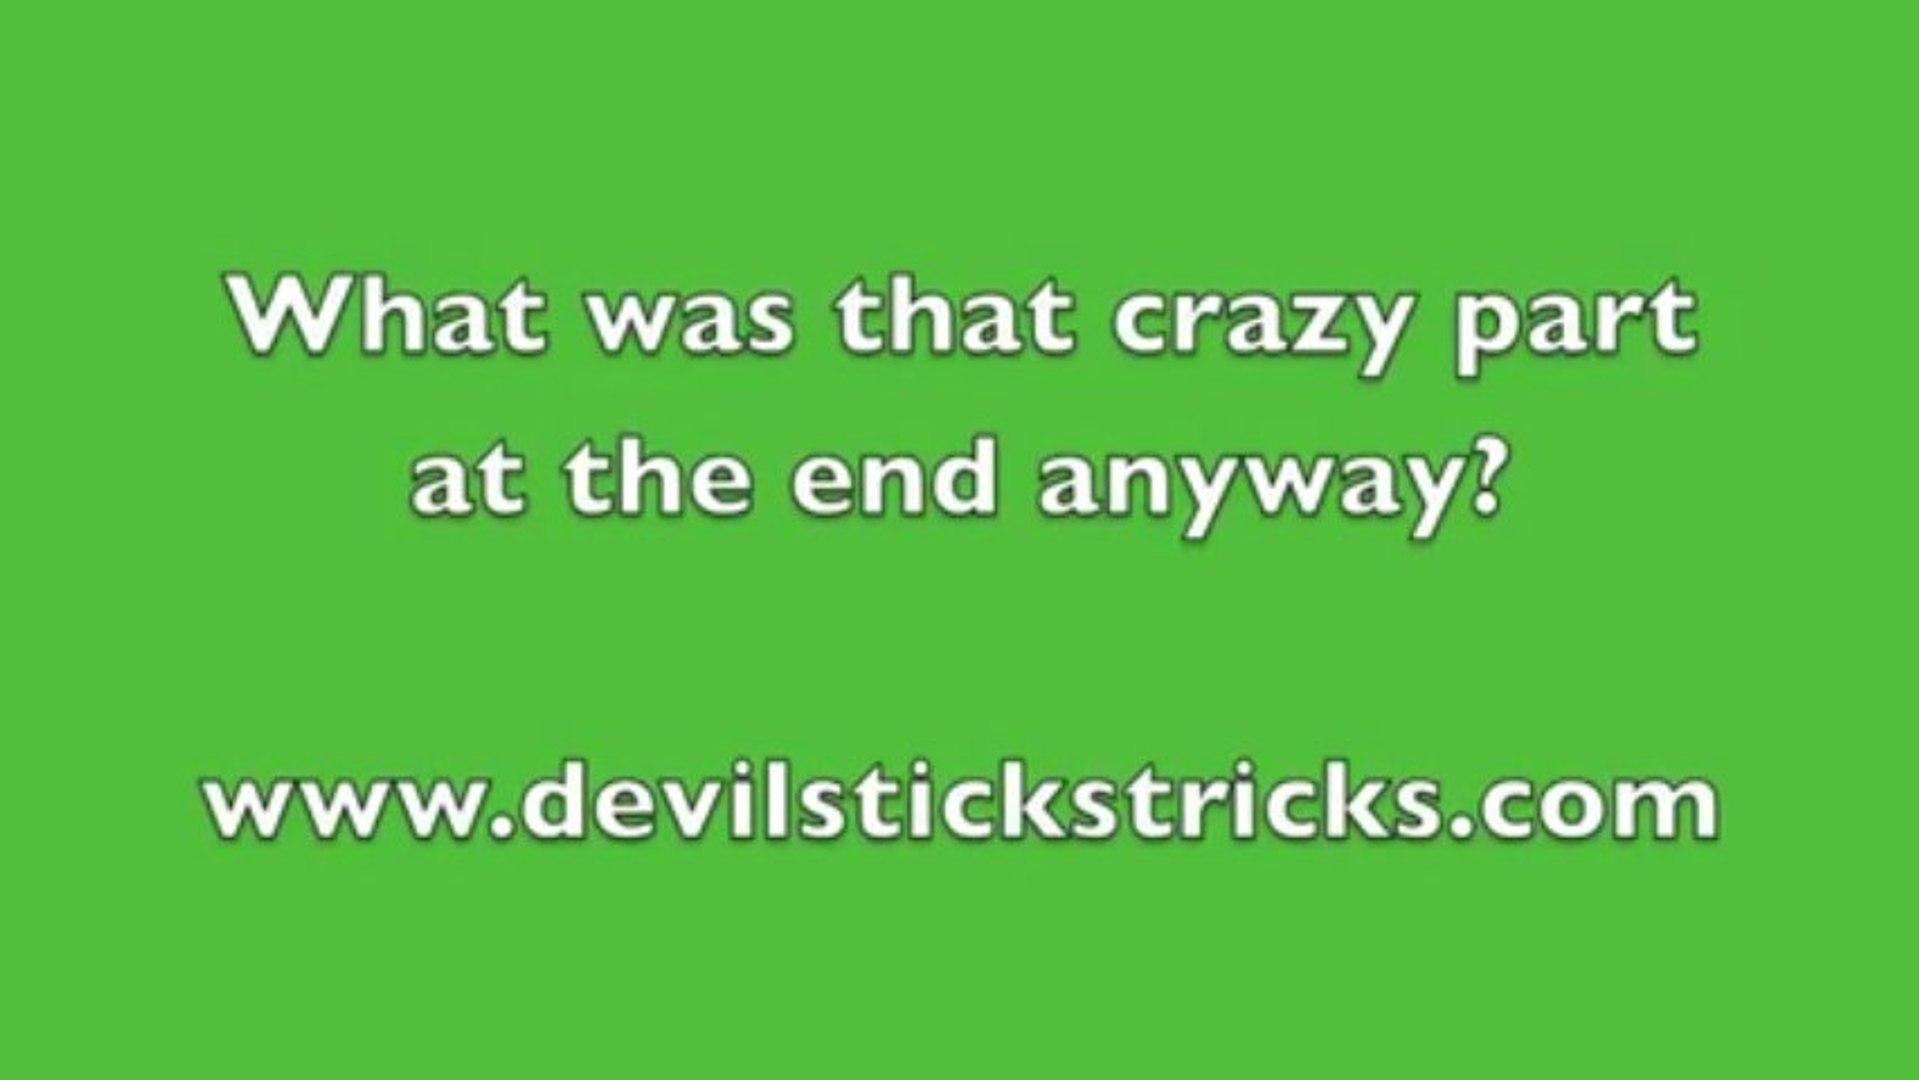 My Devil Sticks Tutorials: Expert Devil Sticks Tutorials in Slow Motion